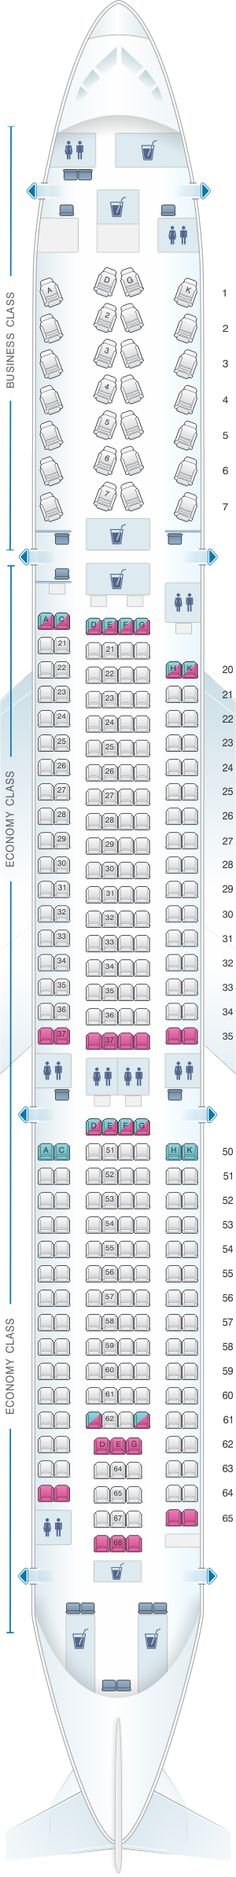 Seat Map Lufthansa Airbus A340 600 281pax | Lufthansa ...